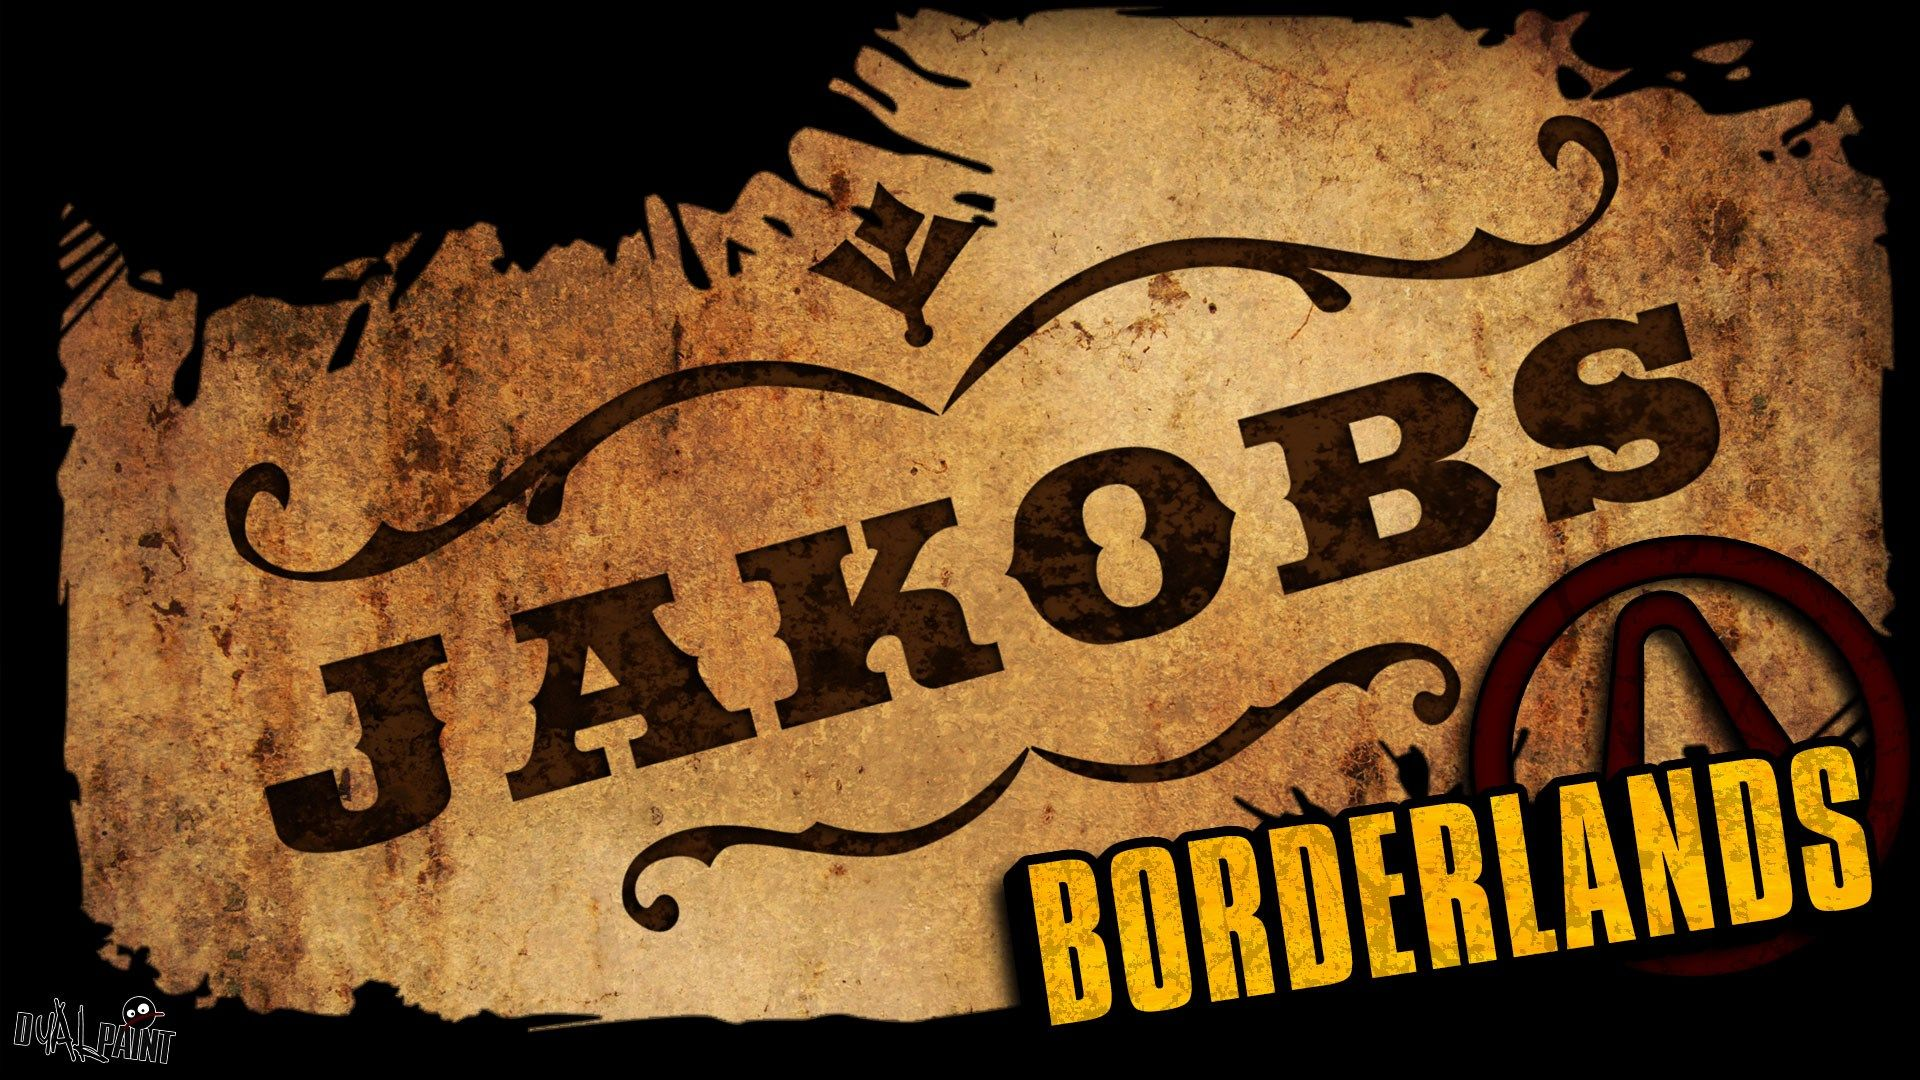 borderlands 2 wallpaper hd pack, 1920x1080 (516 kb) | gogolmogol